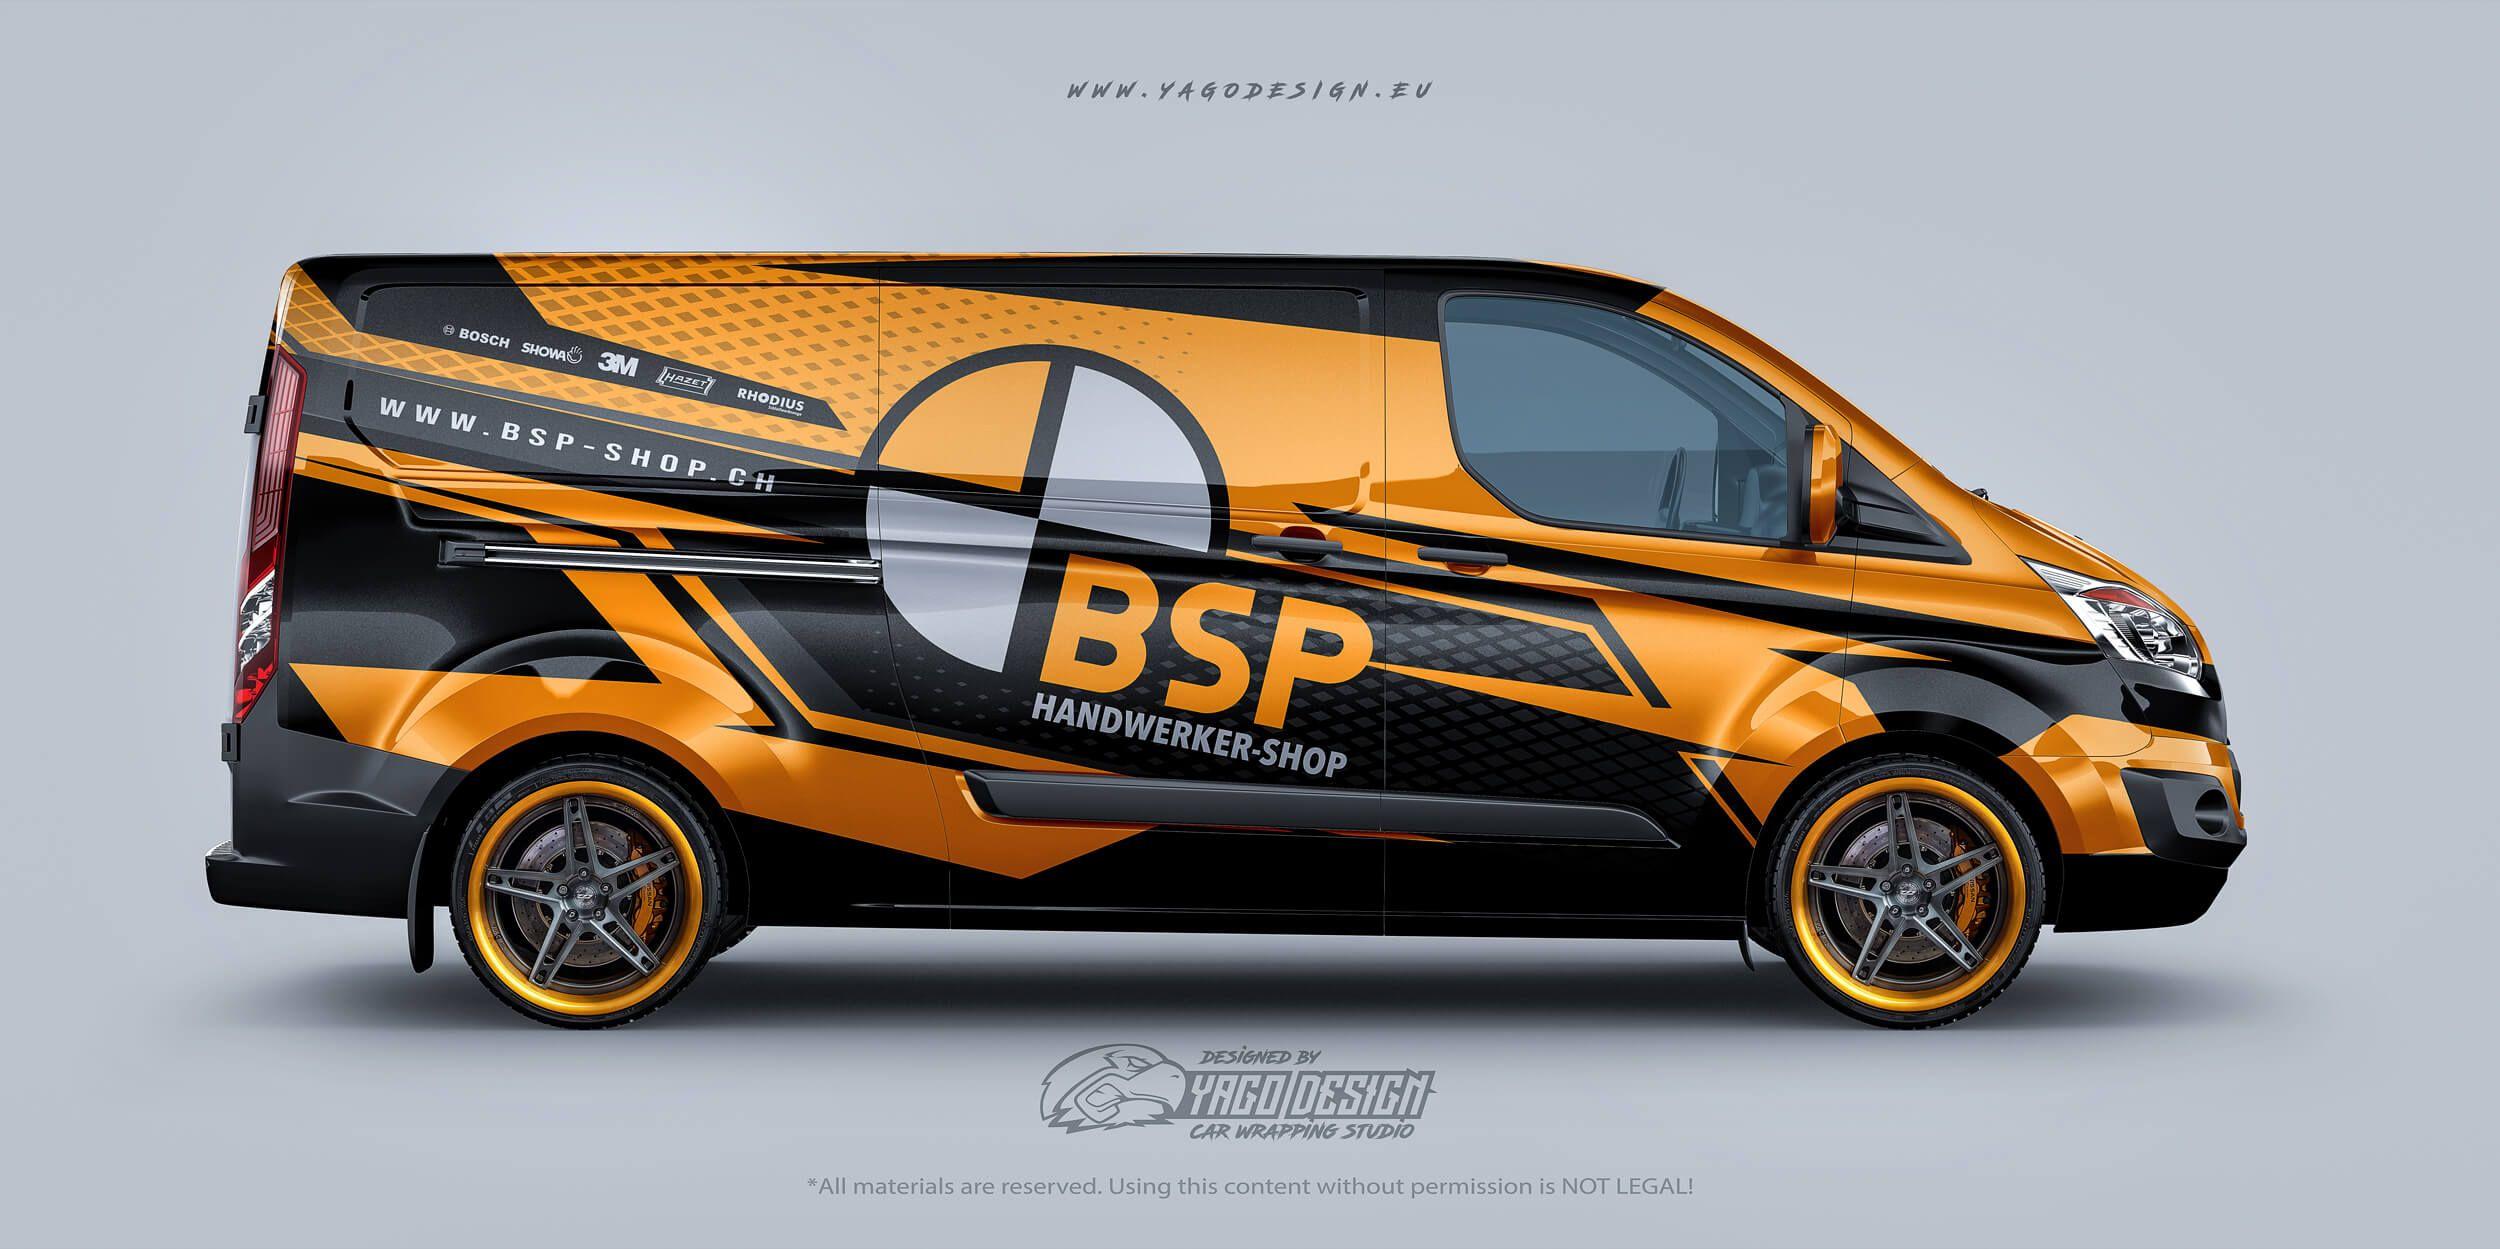 S Ford Transit Custom Bsp Handwerker Shop S Yago Design